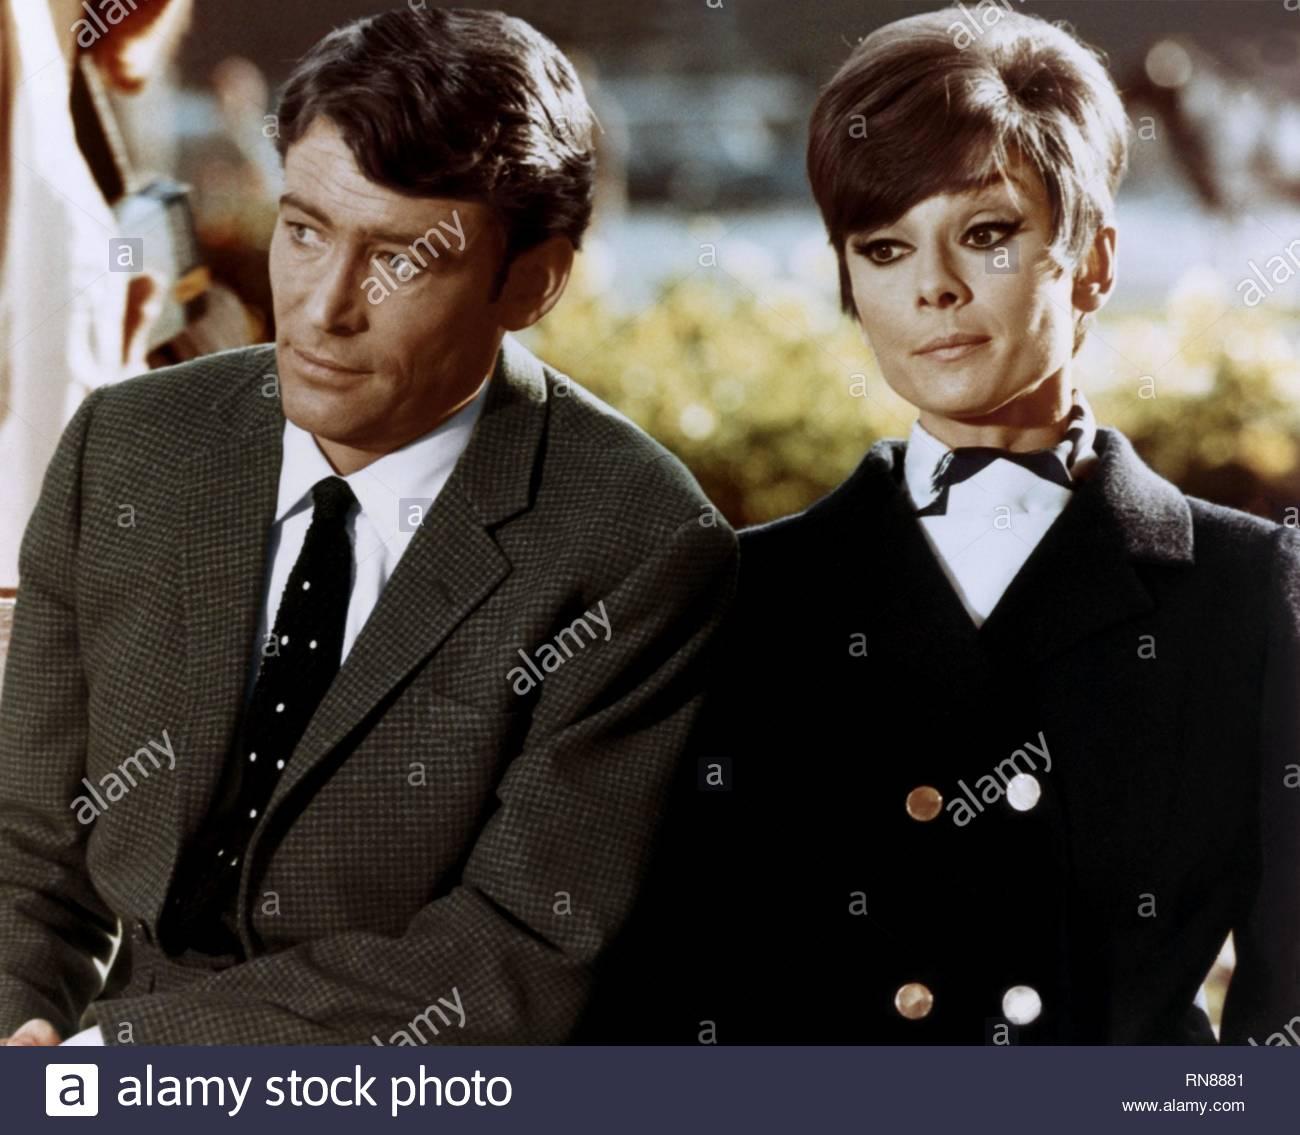 PETER O'TOOLE,Audrey Hepburn, COMMENT VOLER UN MILLION DE DOLLARS, 1966 Photo Stock